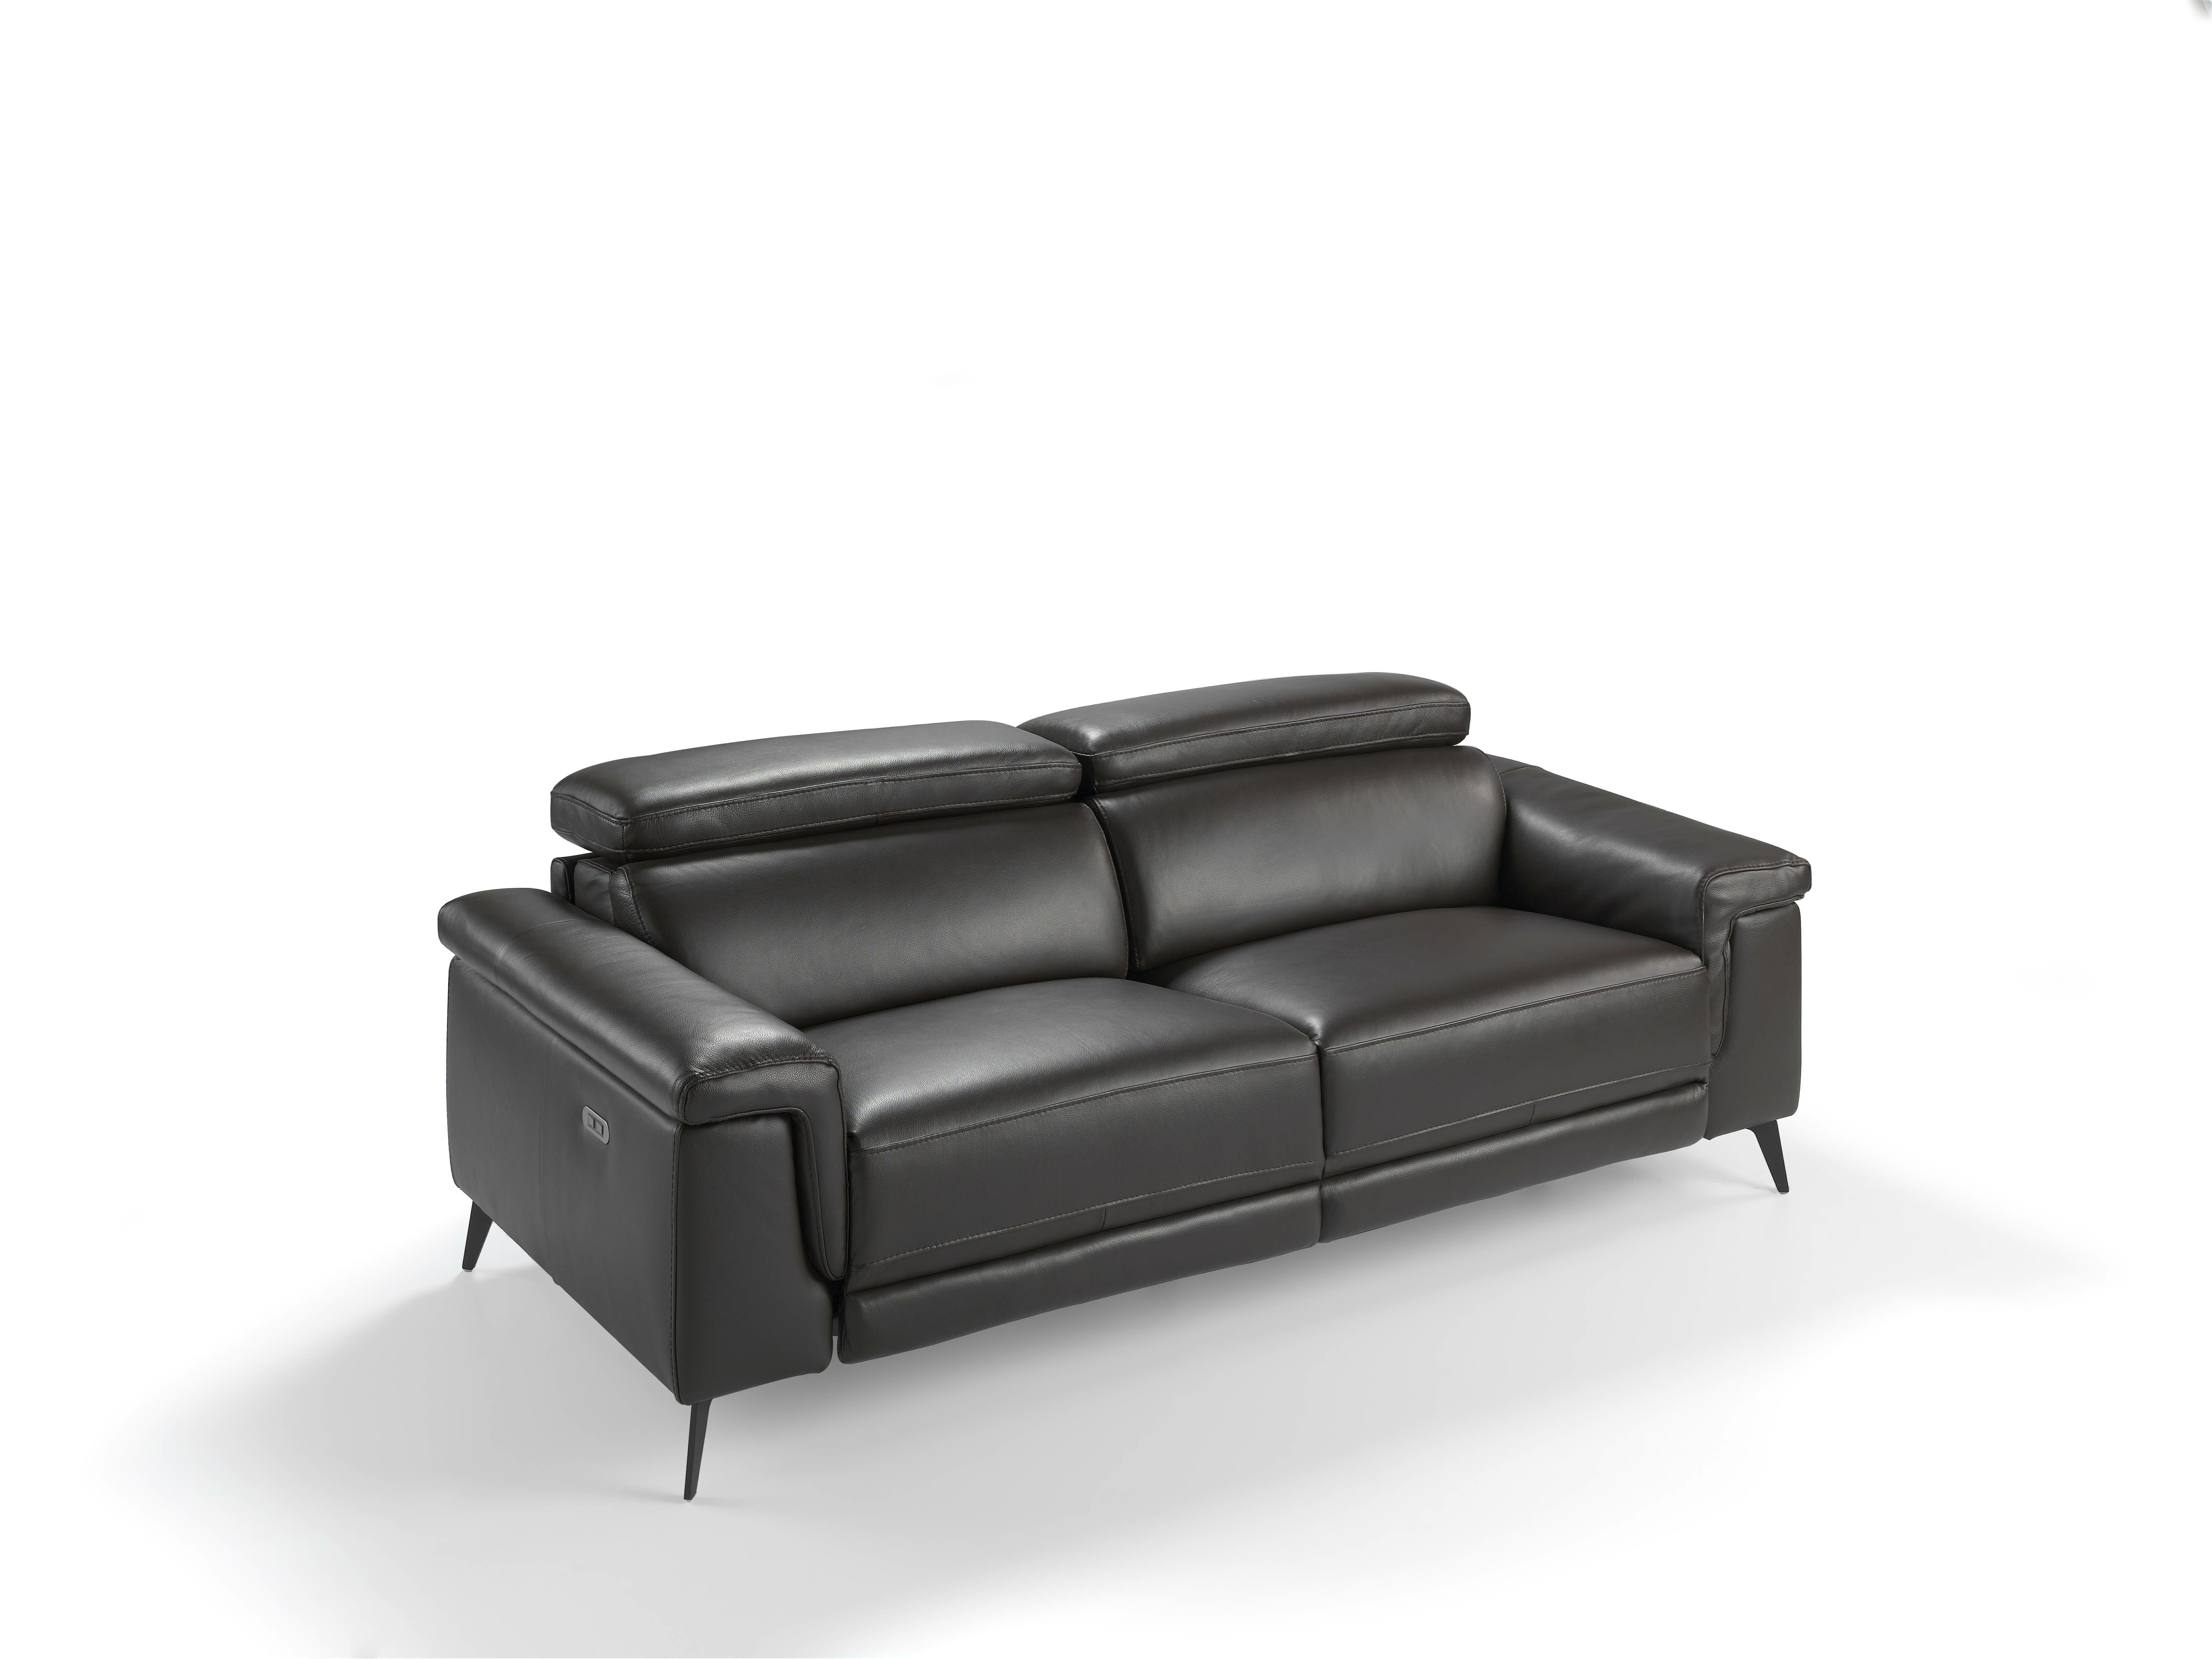 Ebeling Genuine Leather Upholstered